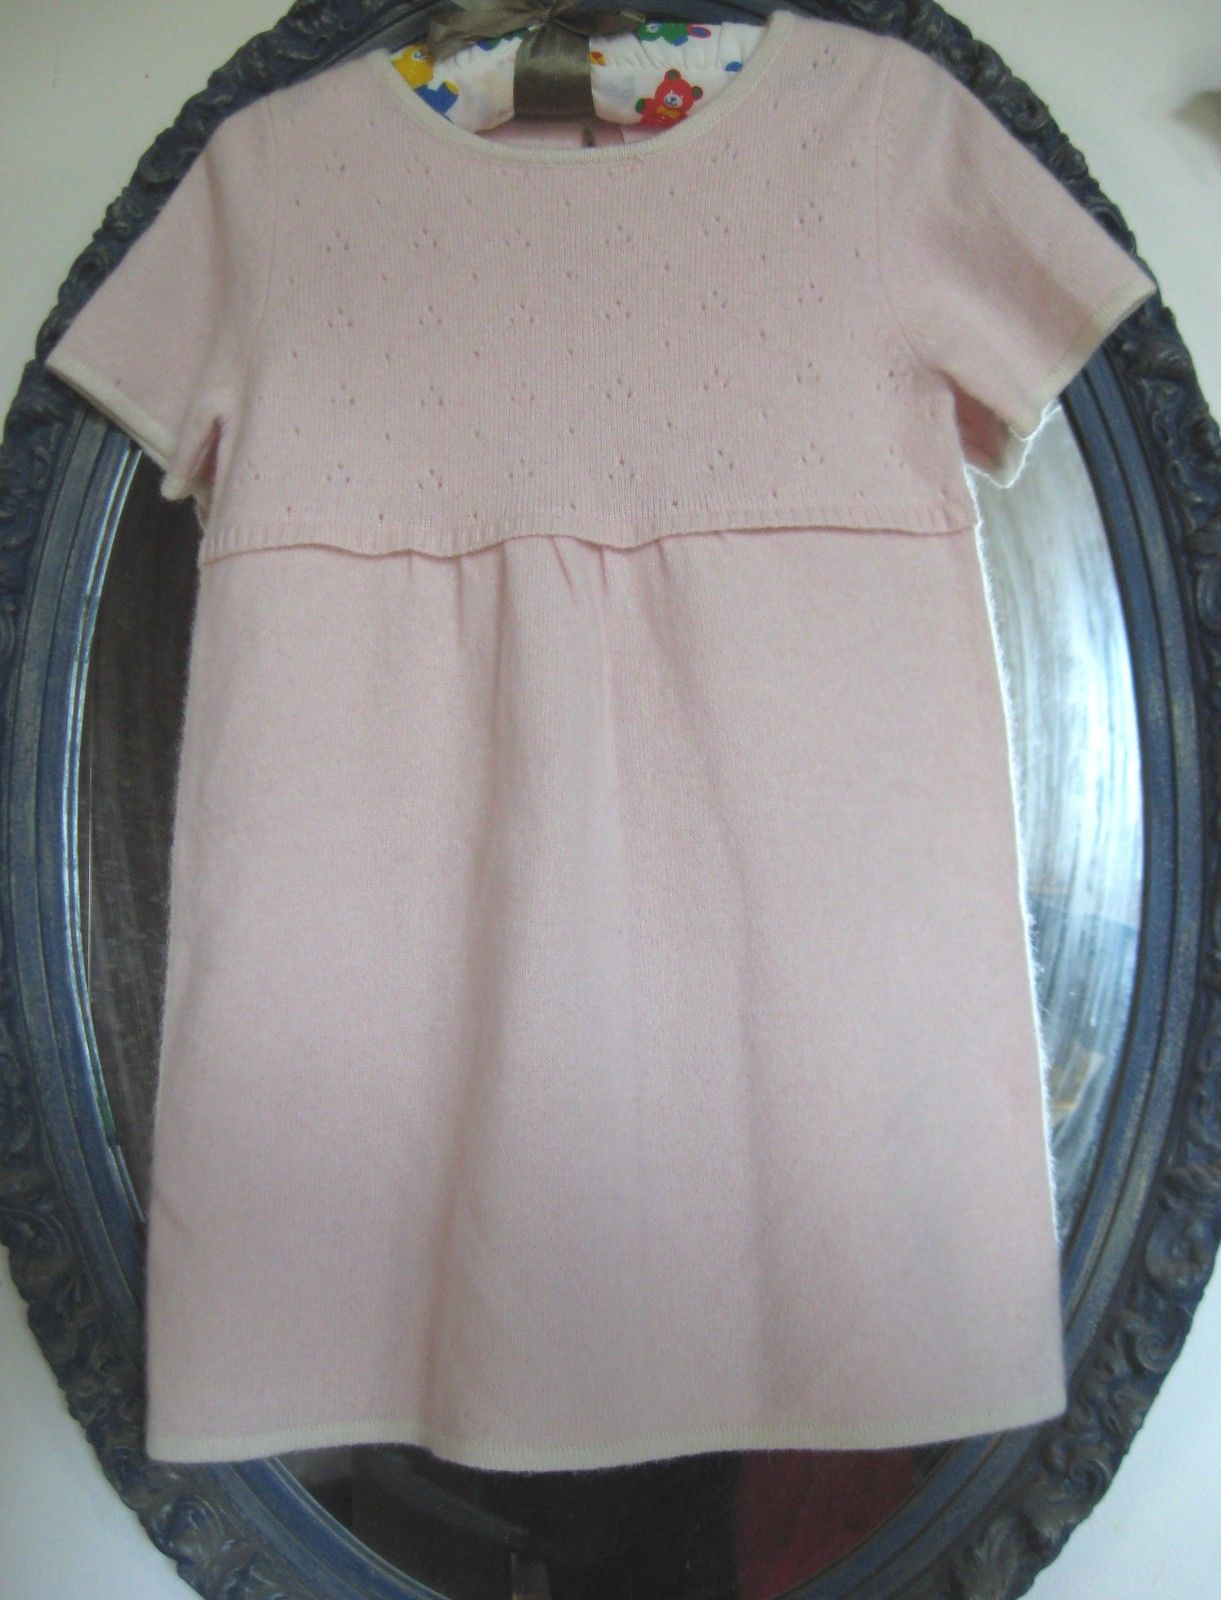 NWT Girls Pink Stripe Cardigan Sweater,Top Pink Tutu Skirt  3 pc Outfit SZ 12m-5